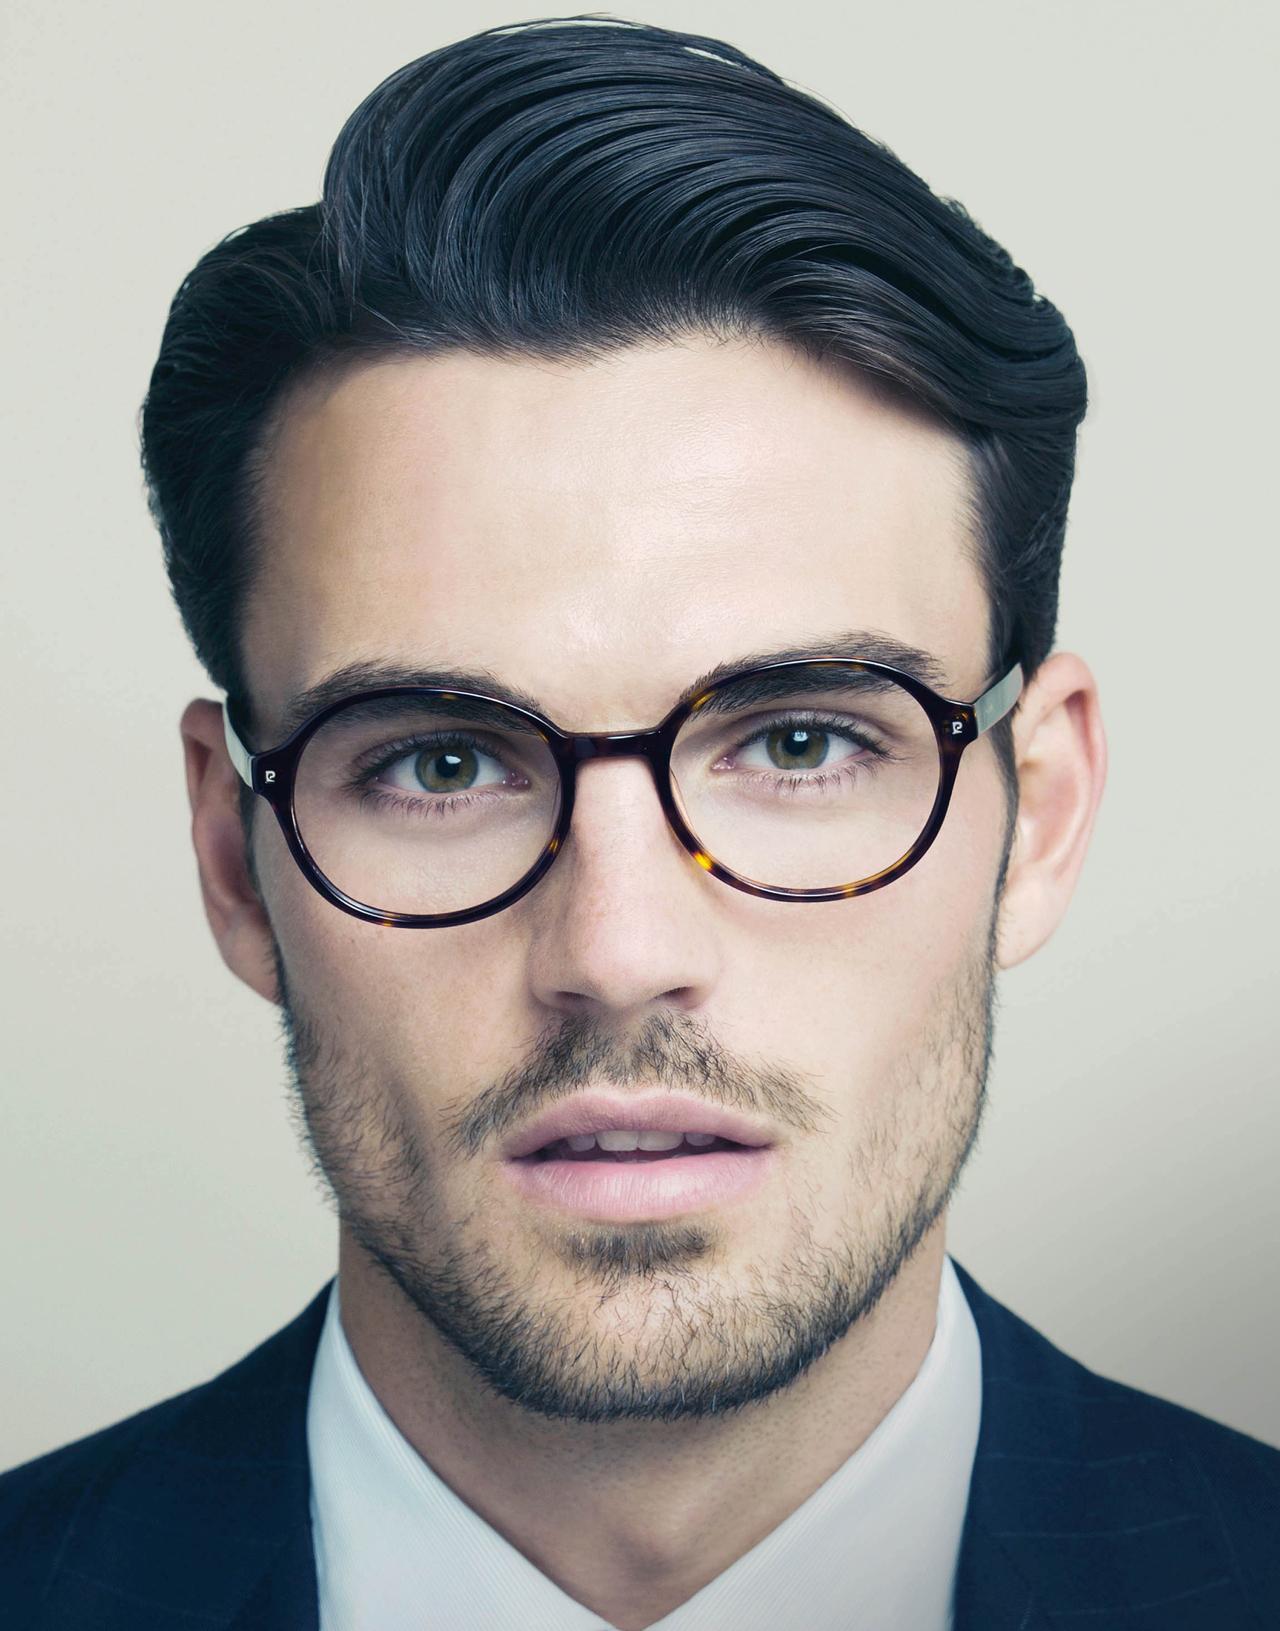 Moda masculina lentes cara hombre carametria caramorfoligia